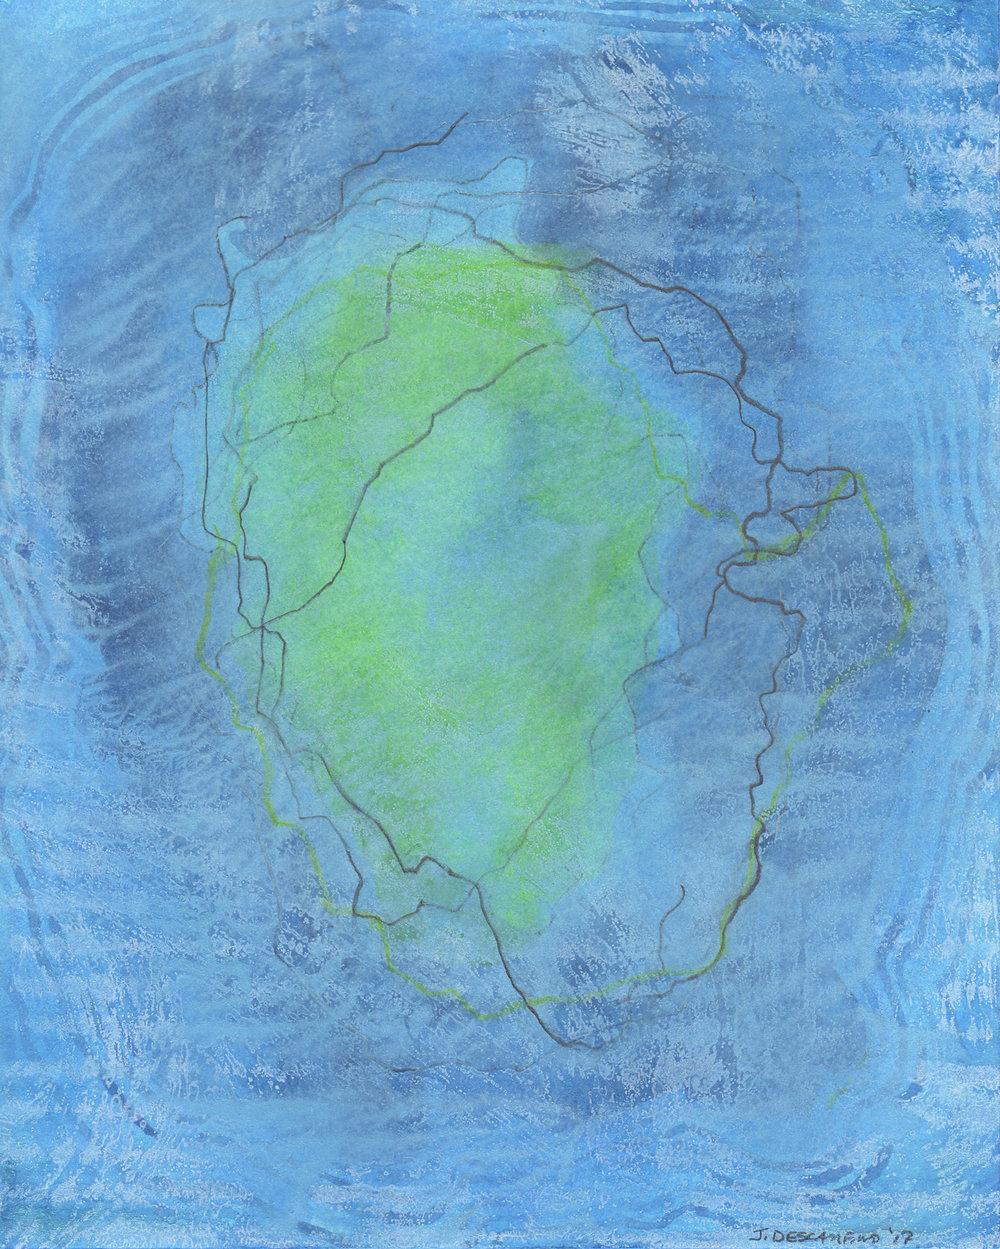 """Blind Navigations: St Brendan's Island"" (V)  2017"